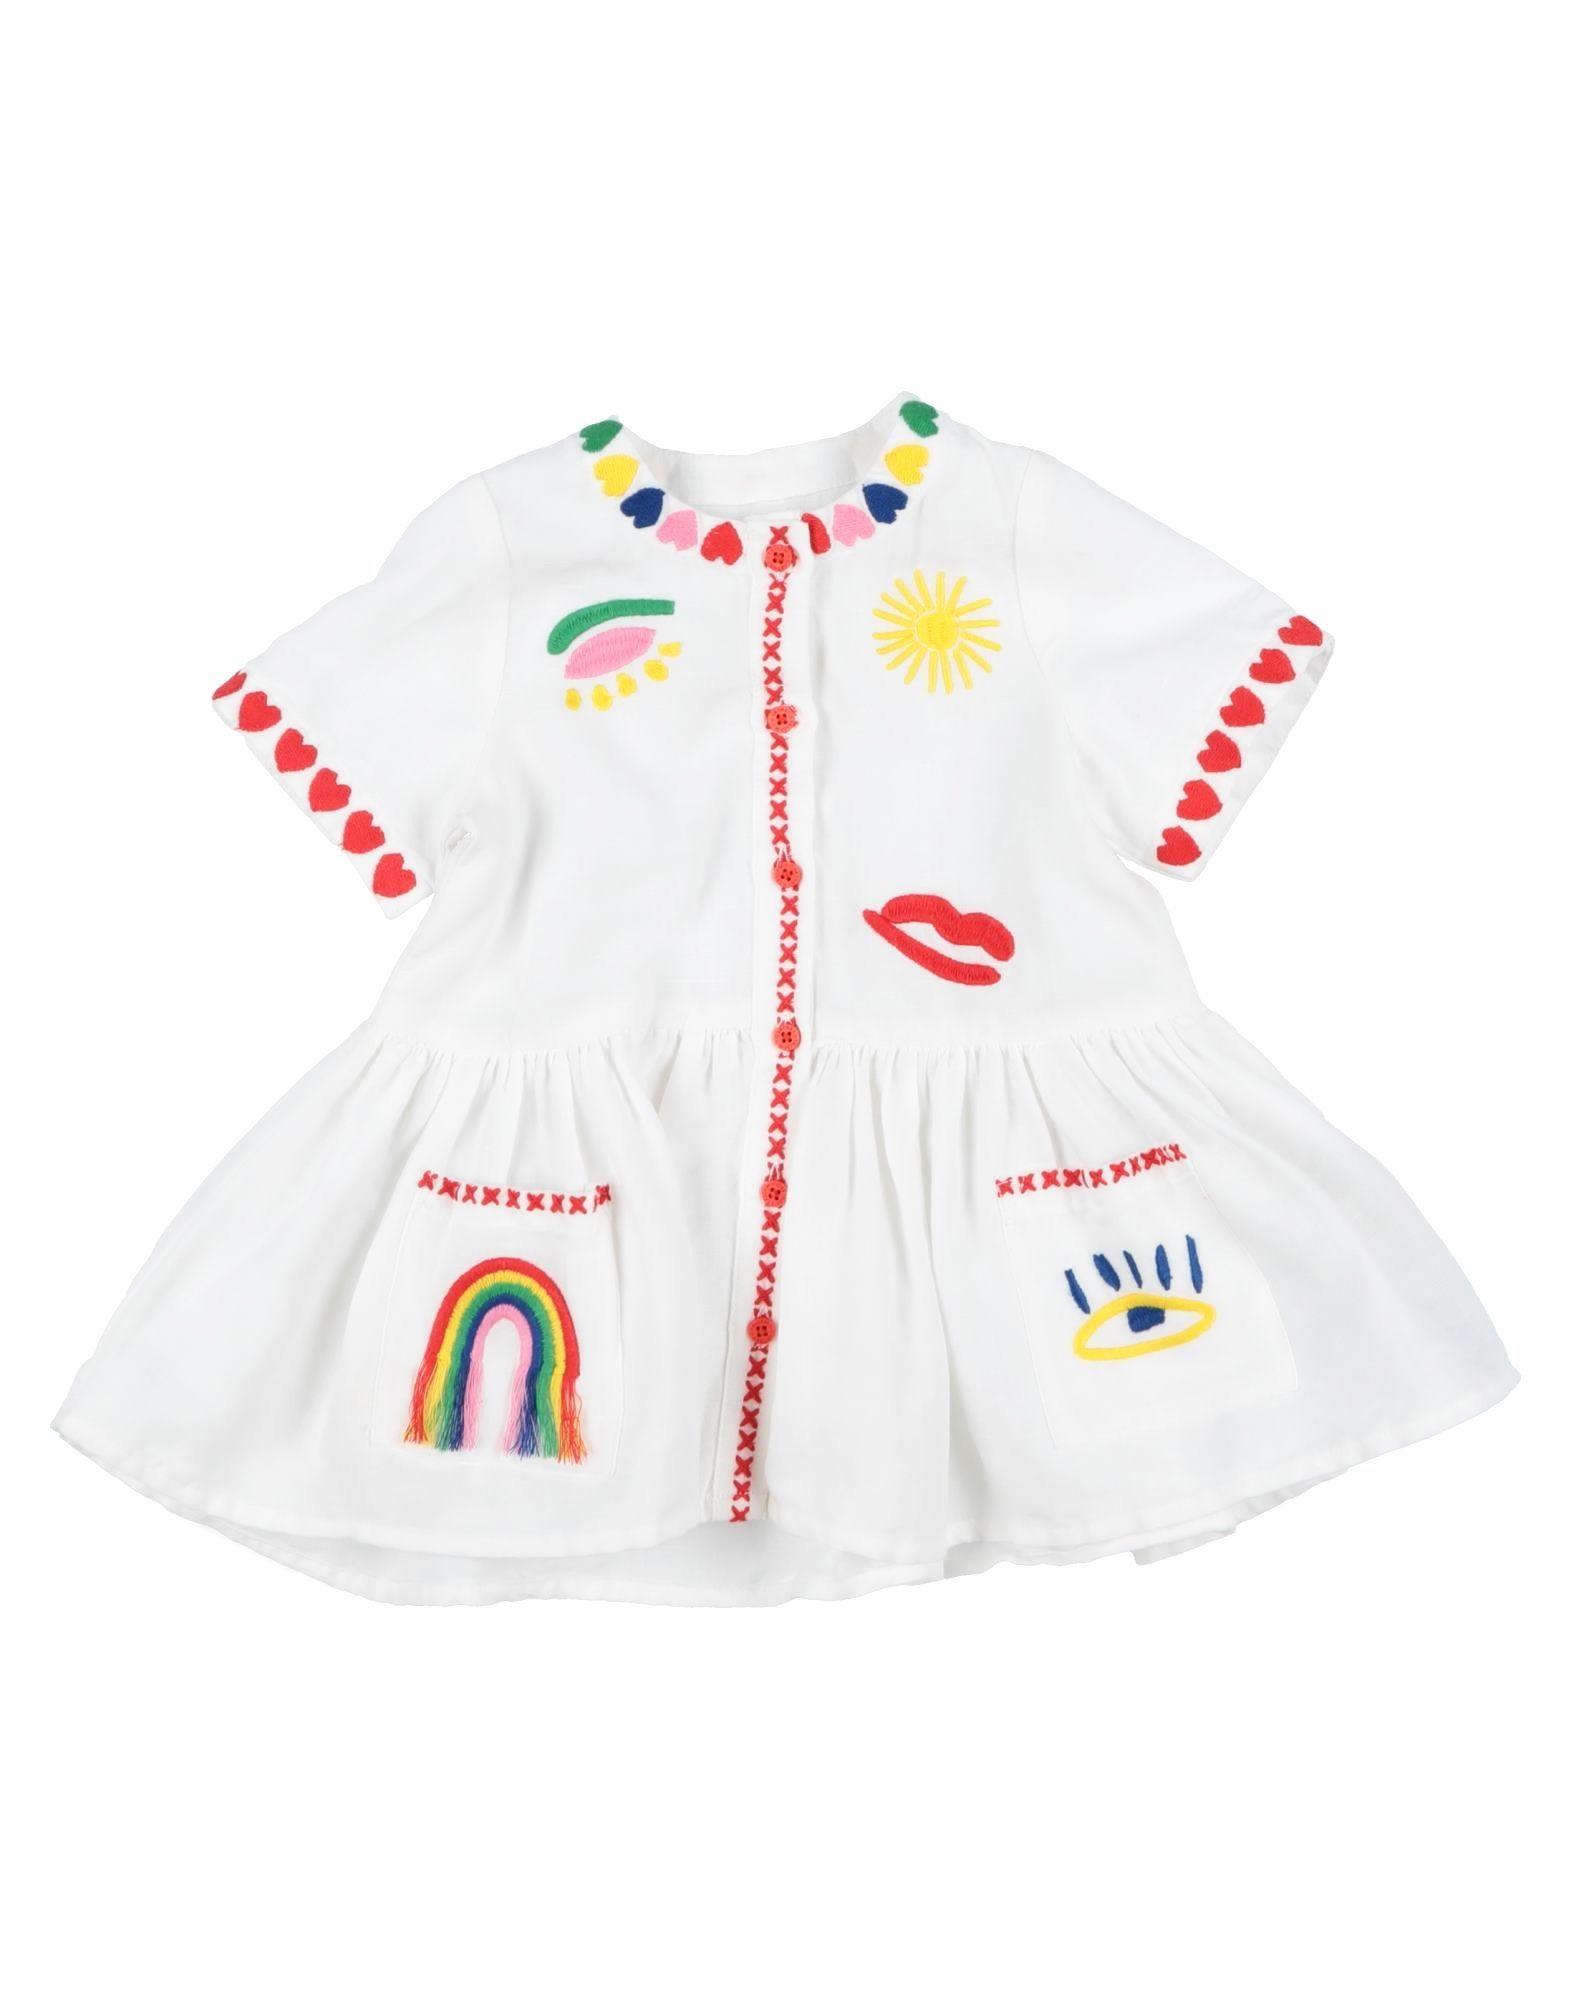 STELLA McCARTNEY KIDS Dresses - Item 15030808